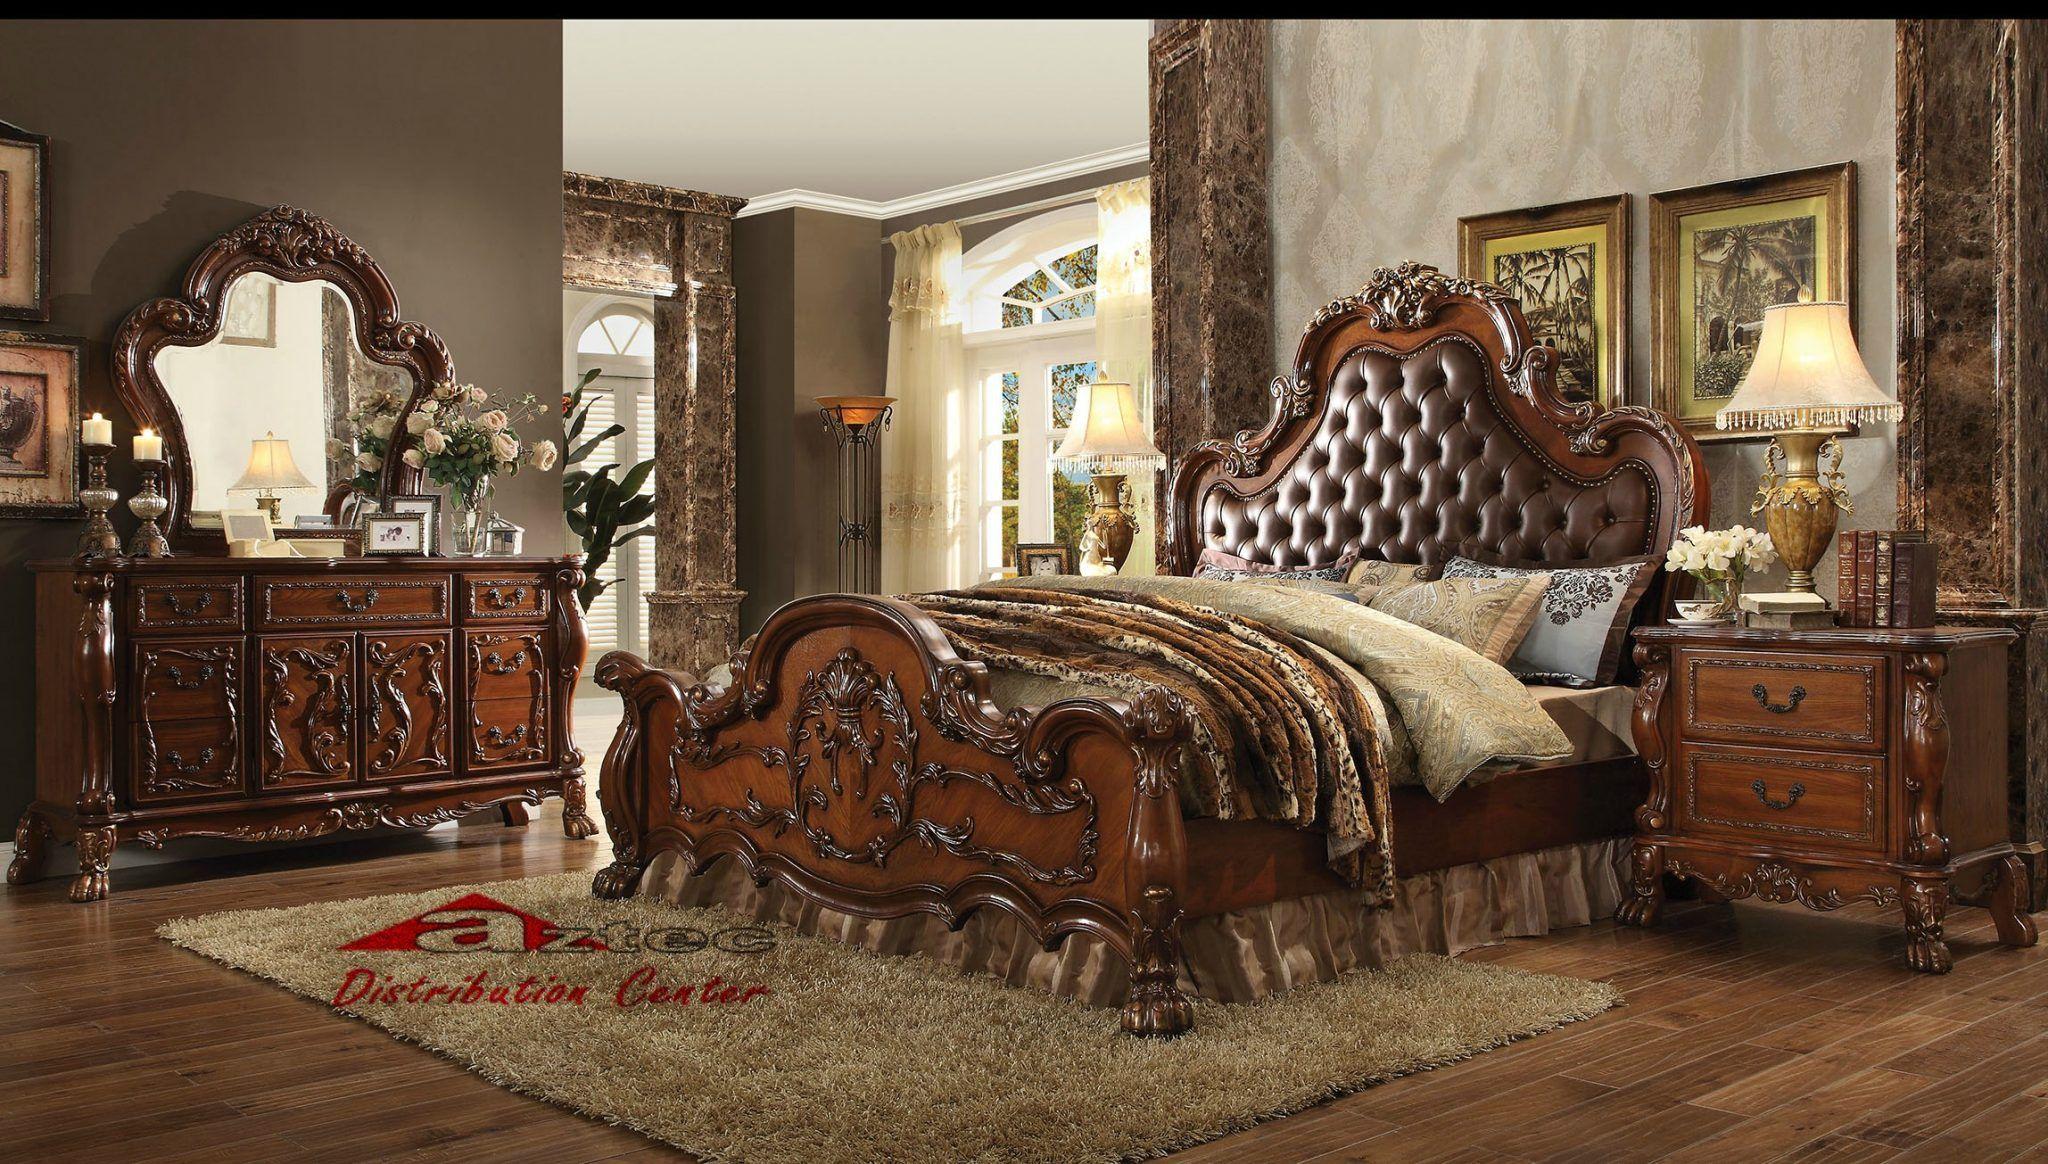 Bedroom Furniture Houston Design Check More At Httpblogcudinti Entrancing Bedroom Furniture In Houston Design Ideas